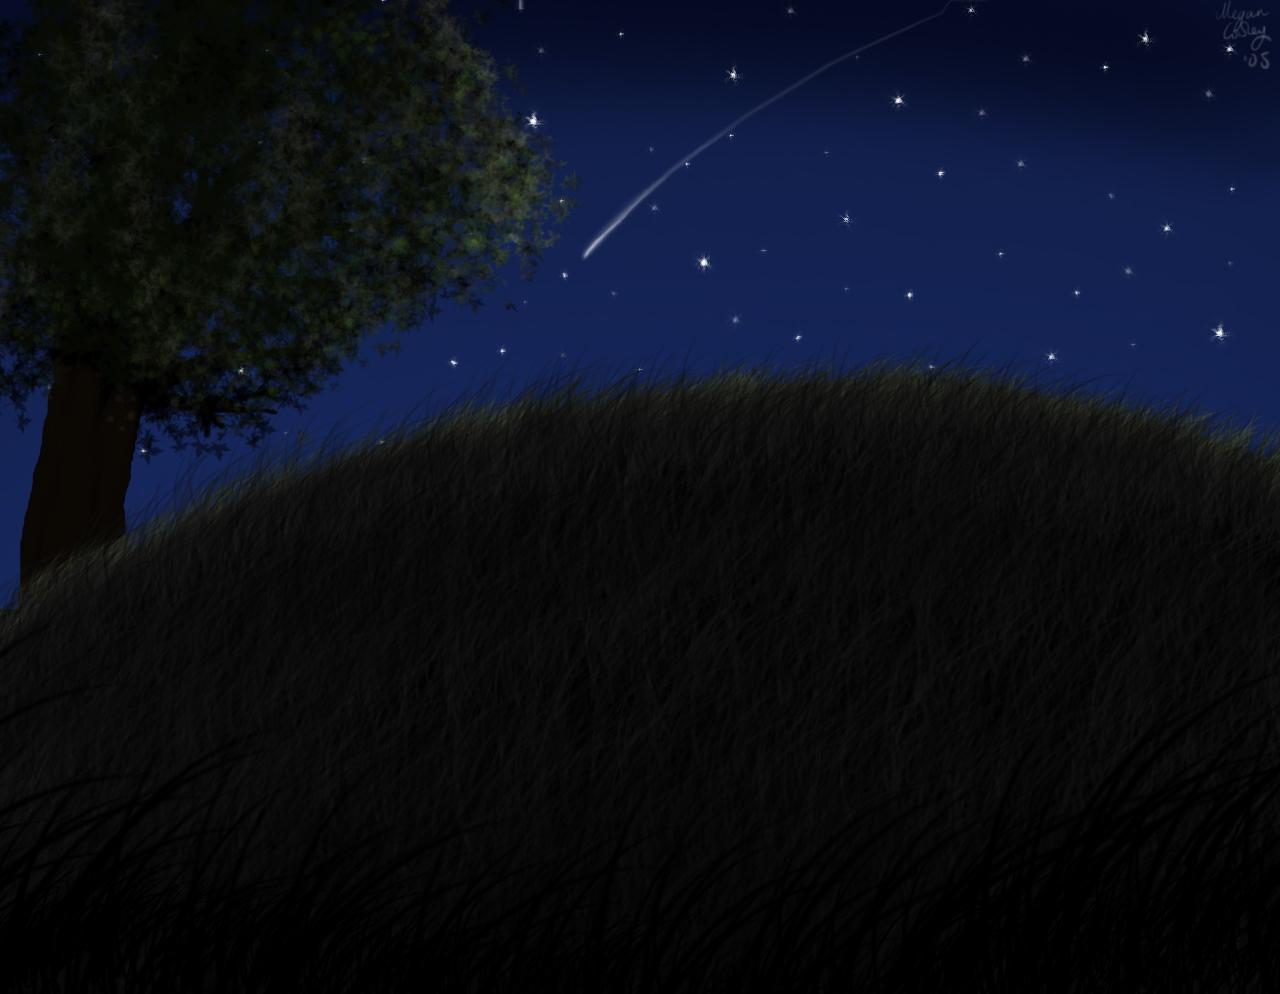 Desktop Shooting Star Credited 1280x994